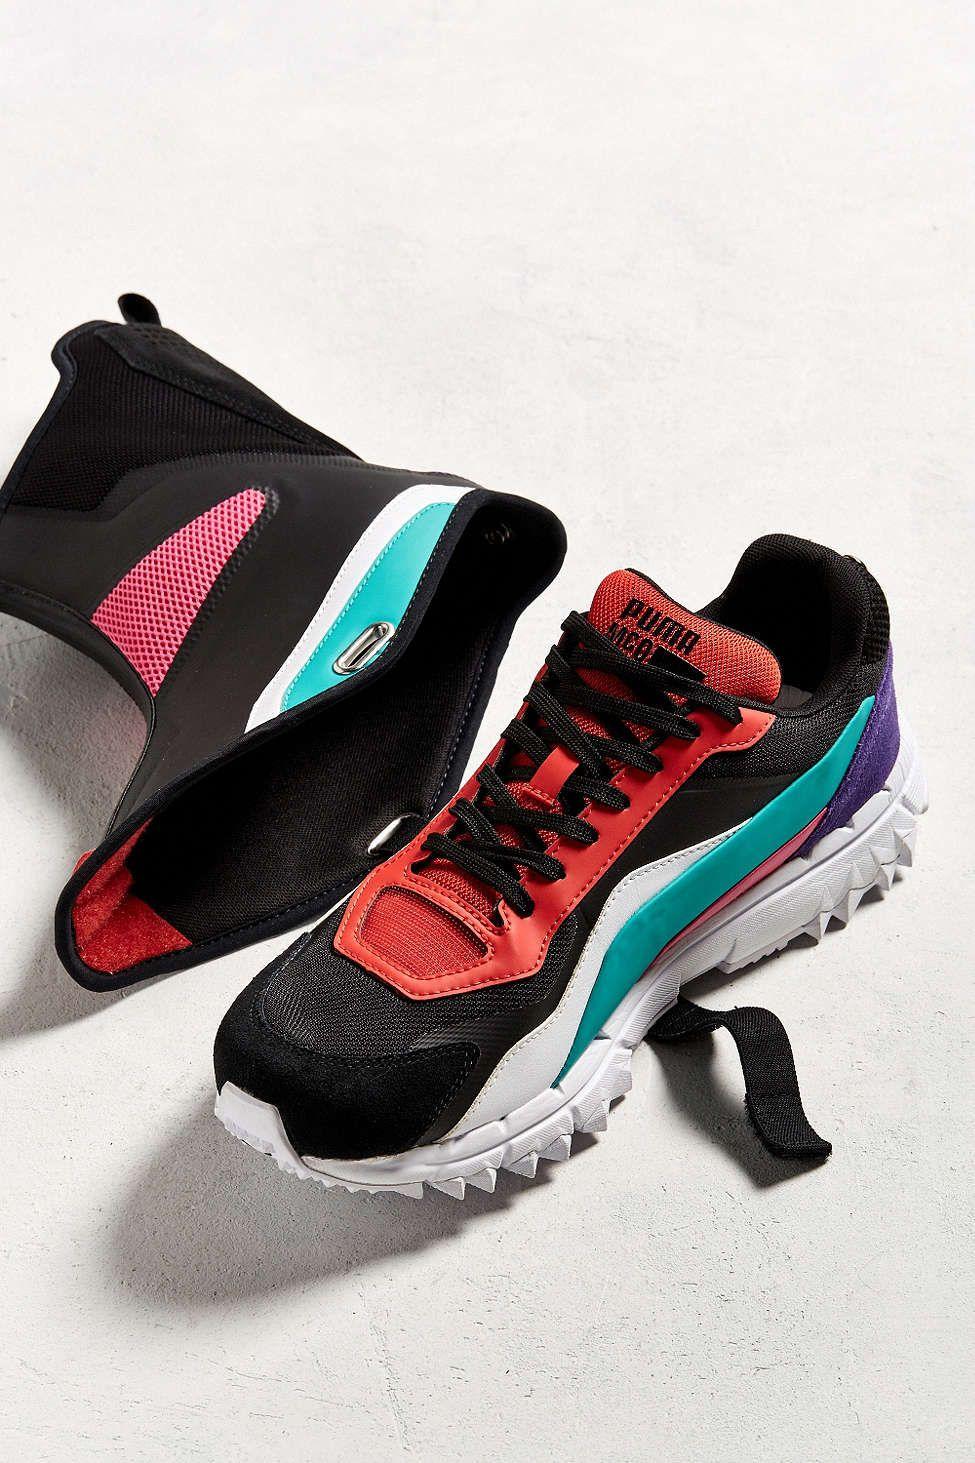 personnalisable alexander chaussures puma mcqueen chaussure